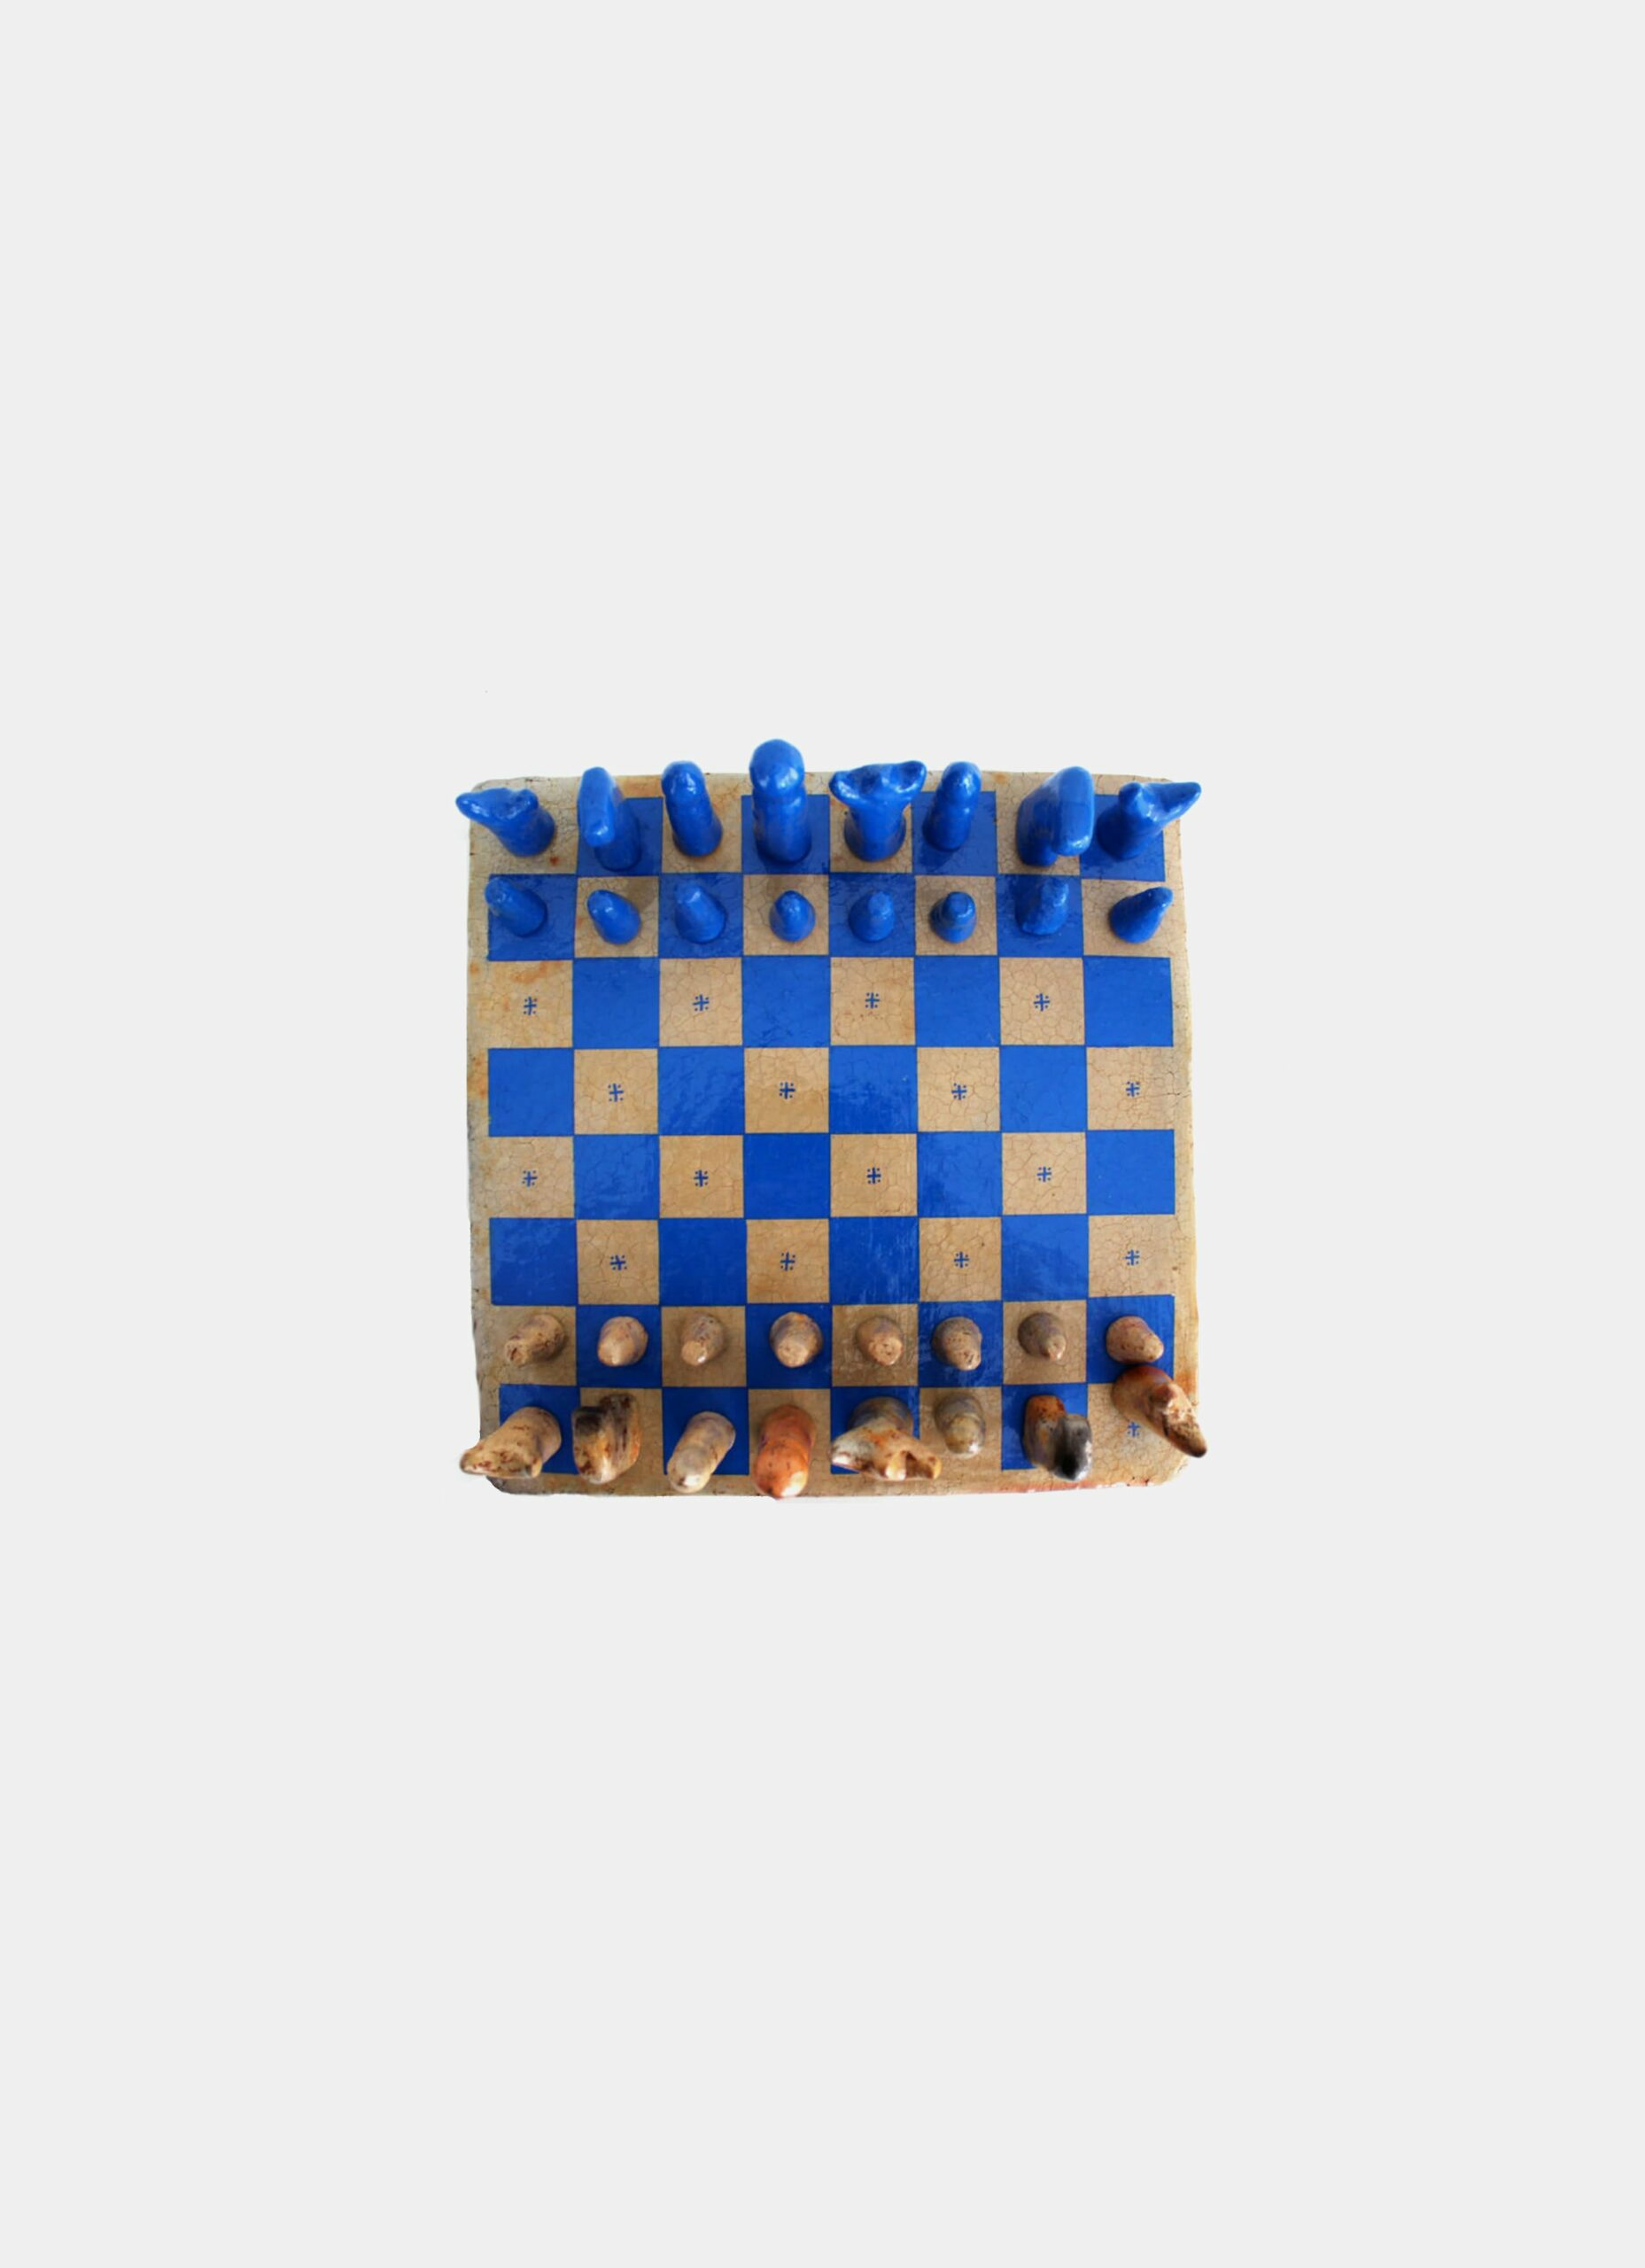 Flayou - Chich-Bich - Terracotta - Chess - Special edition - Neon blue